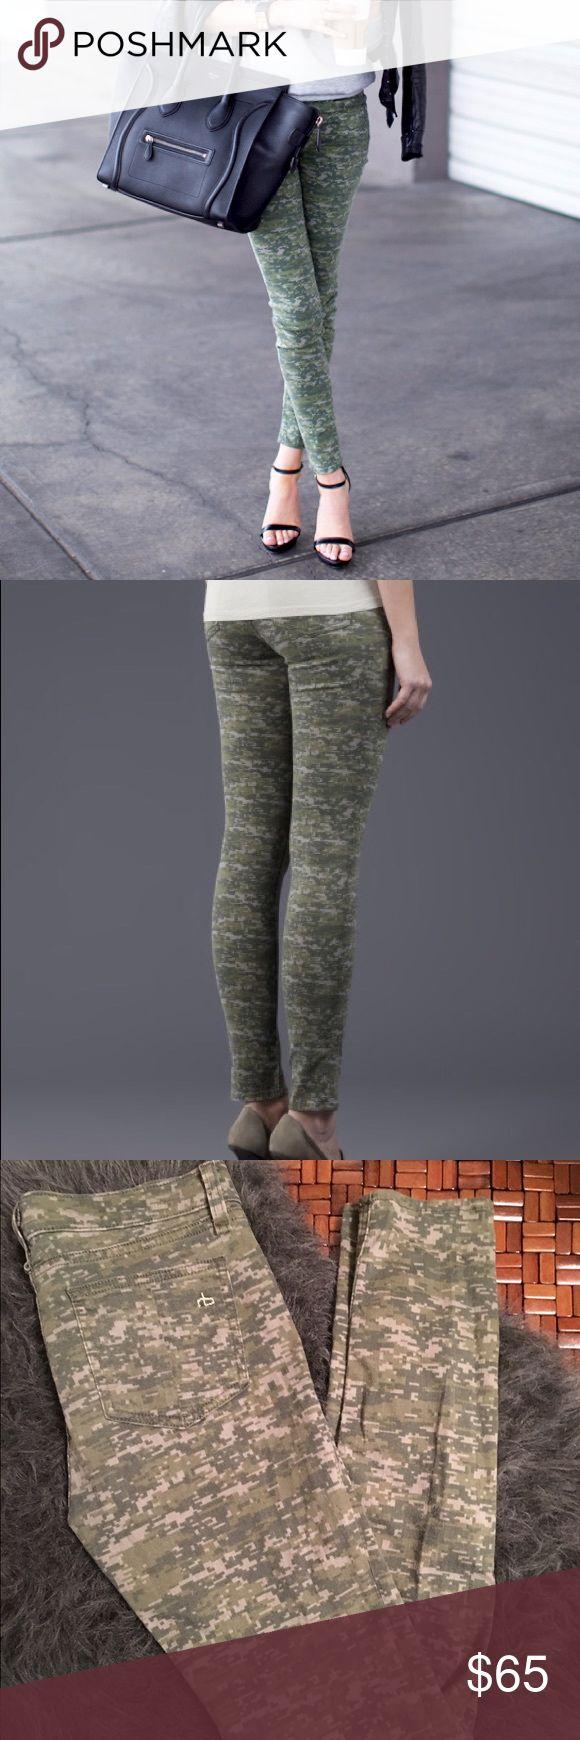 "Rag & Bone Camo Skinny Jeans EUC Rag & Bone ""Digital Camo) Skinny Jeans. Size 27. Tiny pelting patch on rear next to left pocket, not noticeable. rag & bone Jeans Skinny"